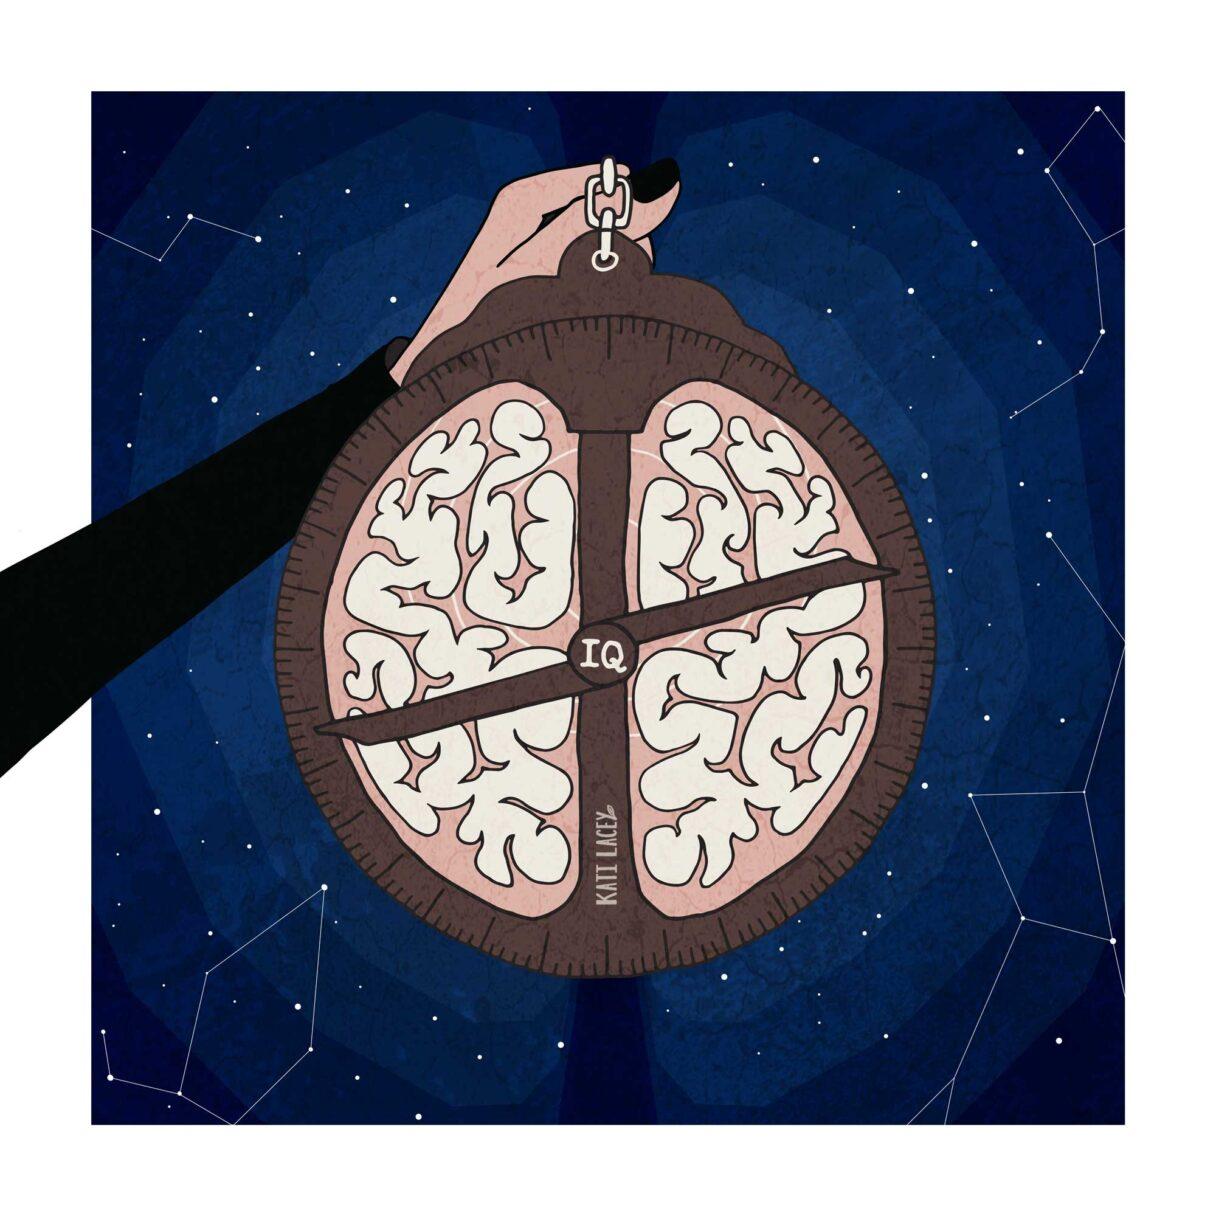 brain-astrolabe-navitaional-tool-editorial-illustration-illustrtator-Kati-Lacey